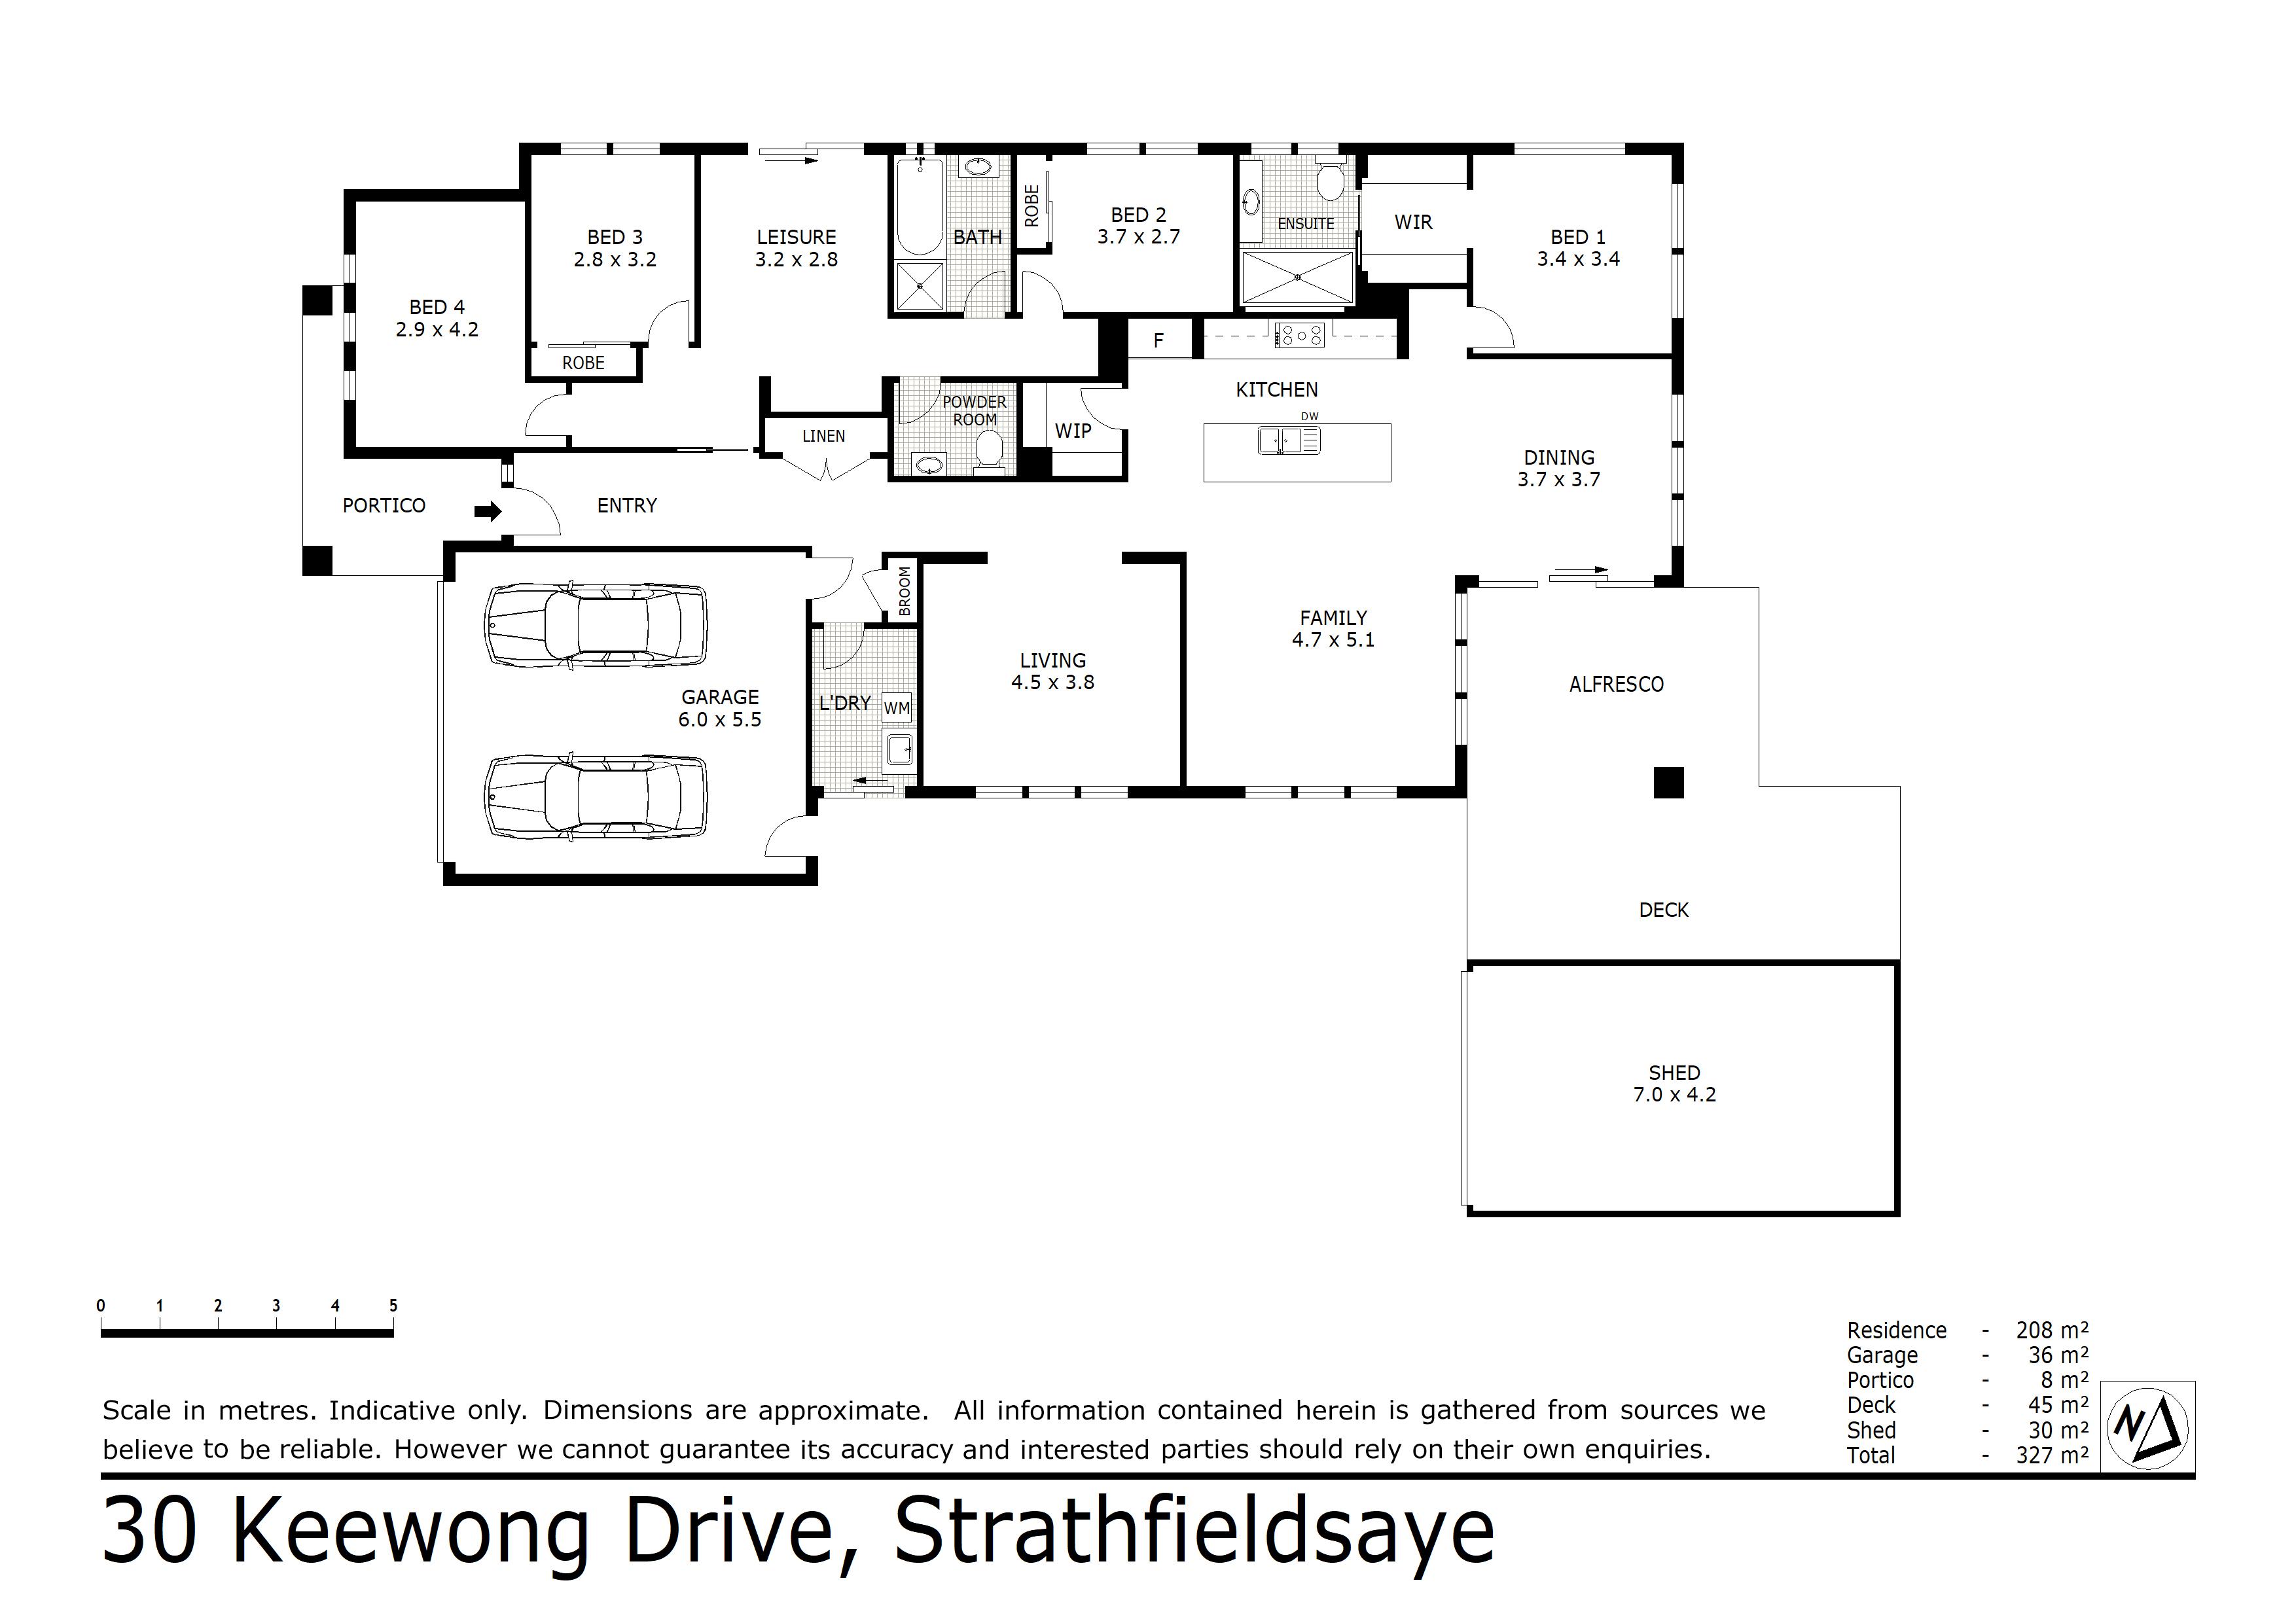 30 Keewong Drive, Strathfieldsaye, VIC 3551